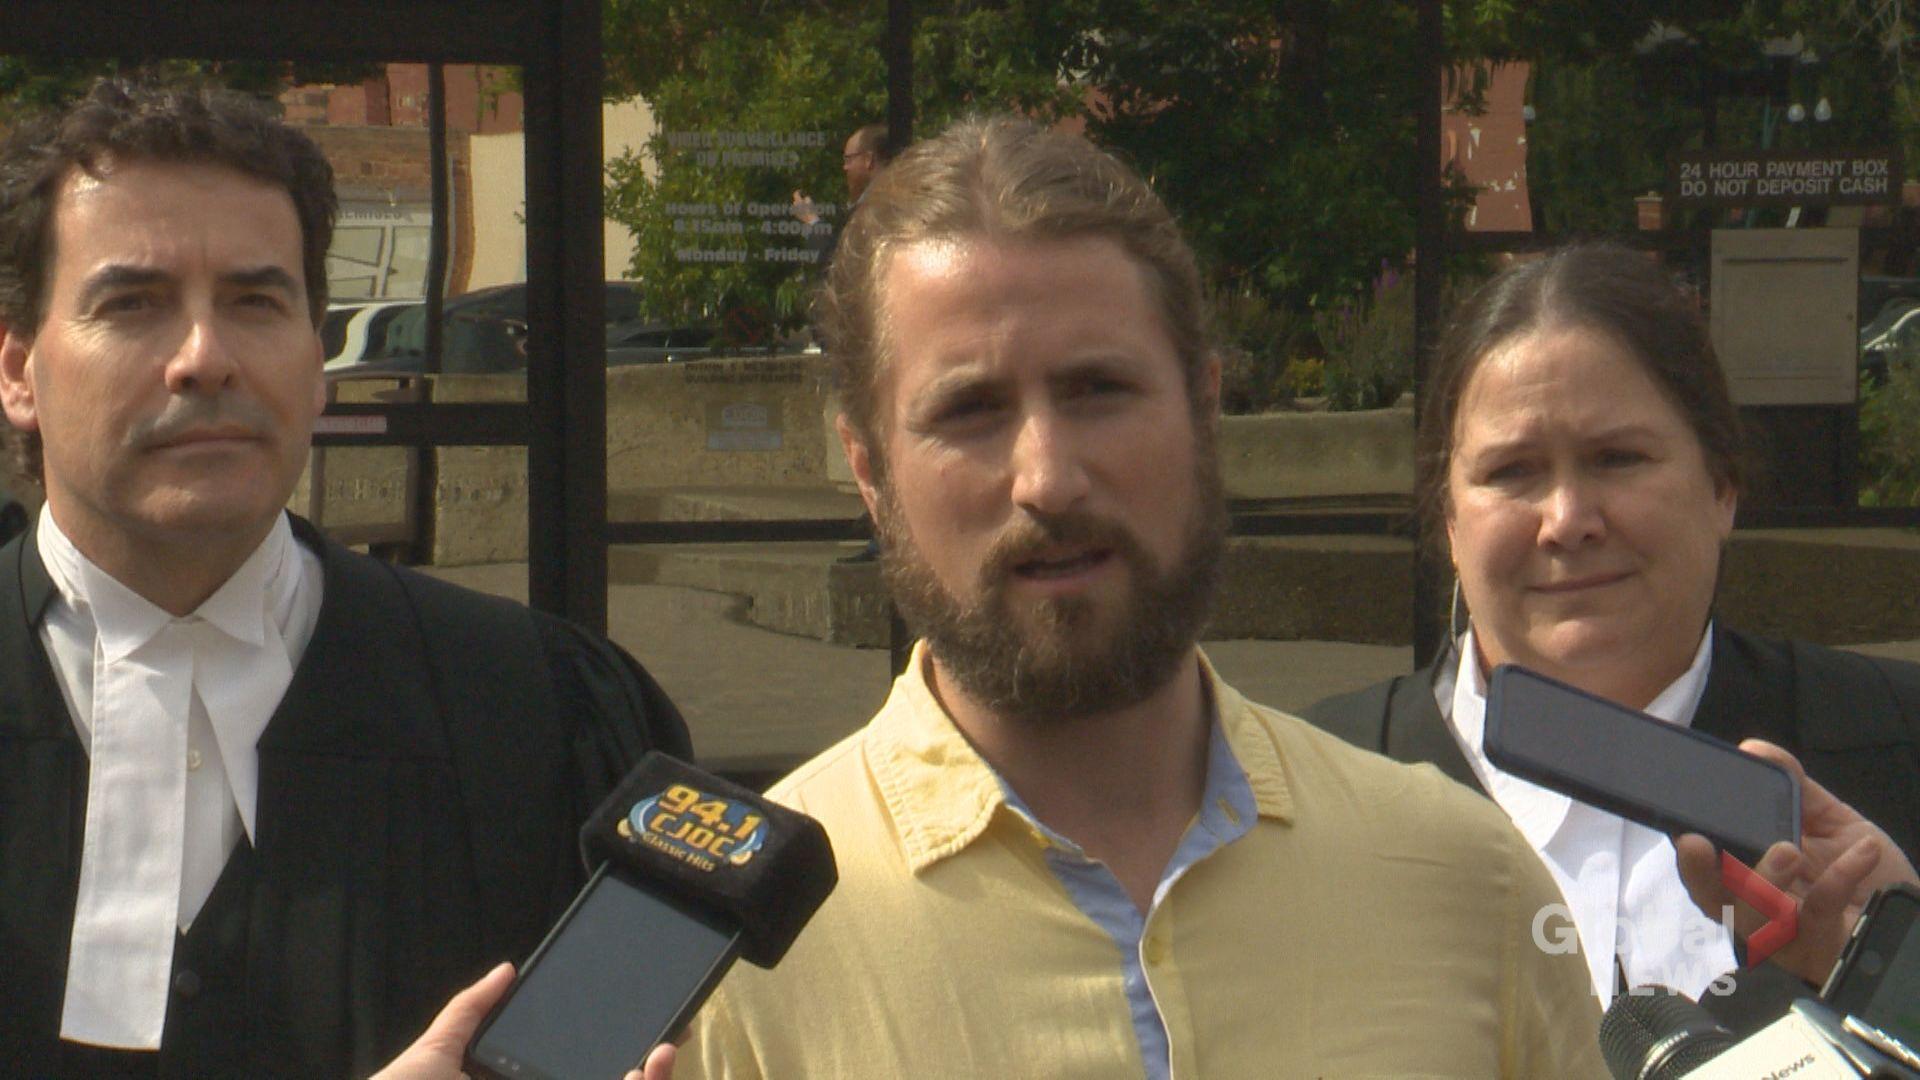 David Stephan speaks to media following acquittal